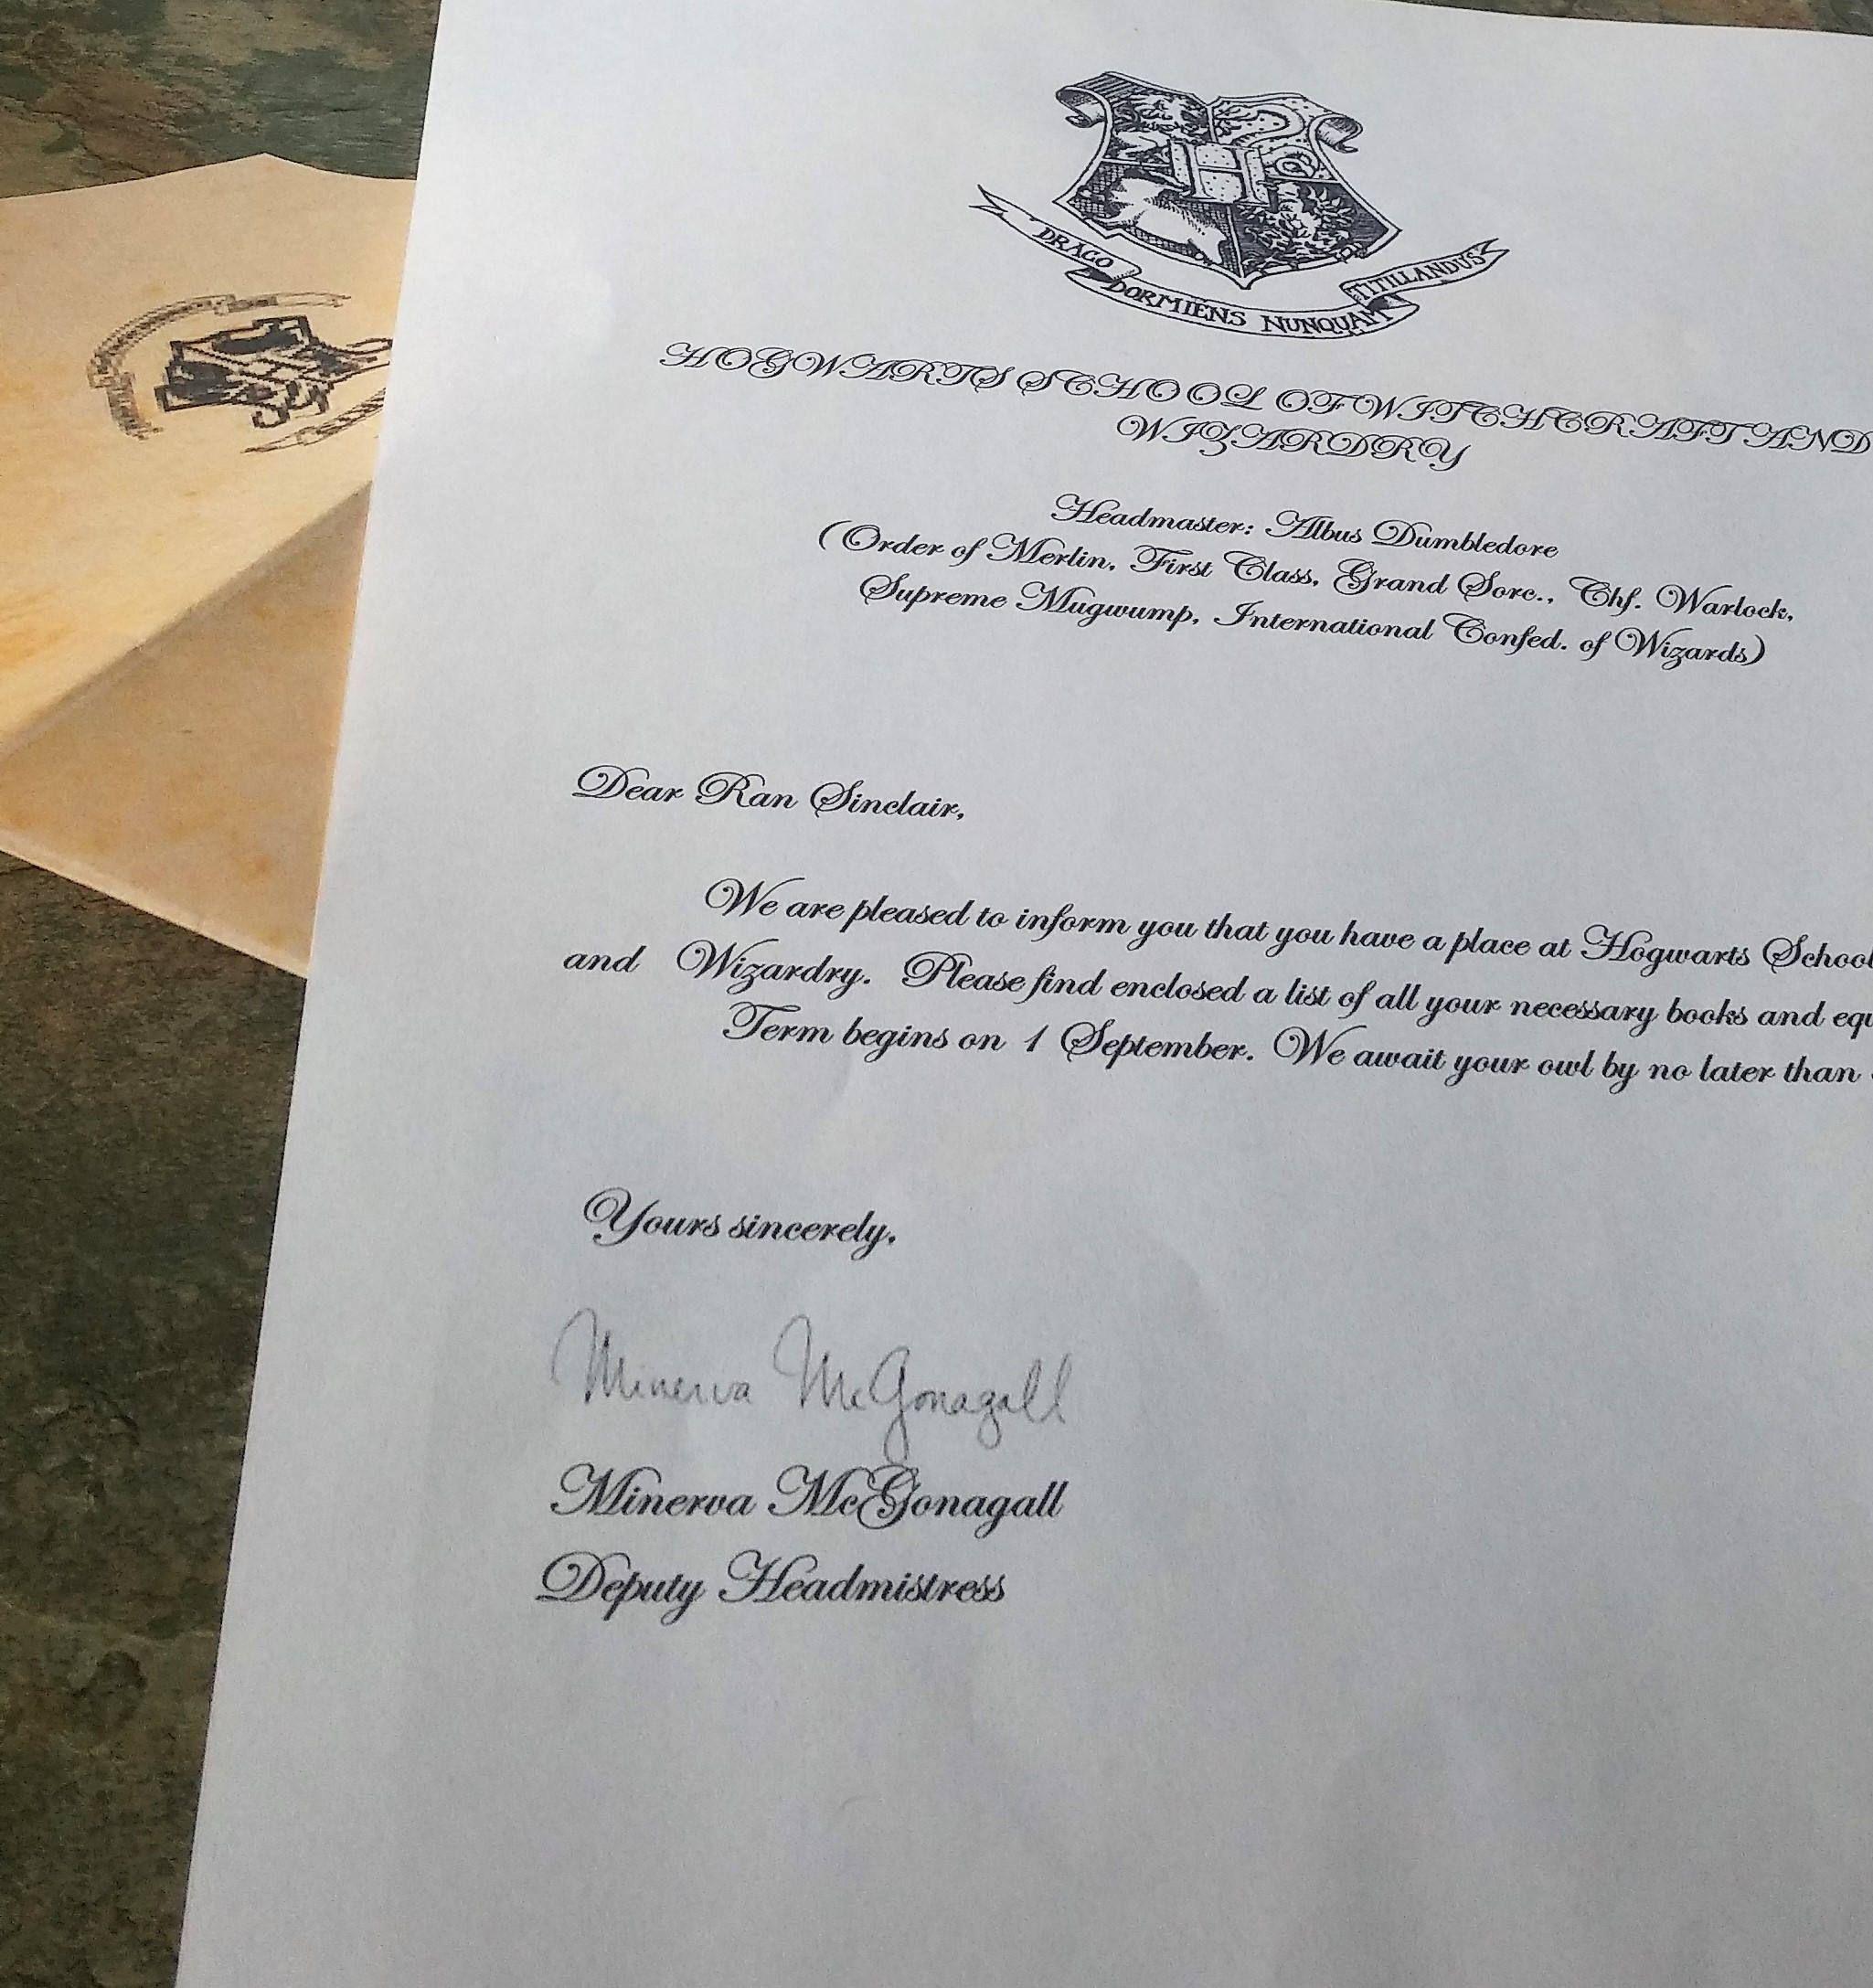 Hogwarts Acceptance Letter,Hogwarts Student ID, Witchcraft